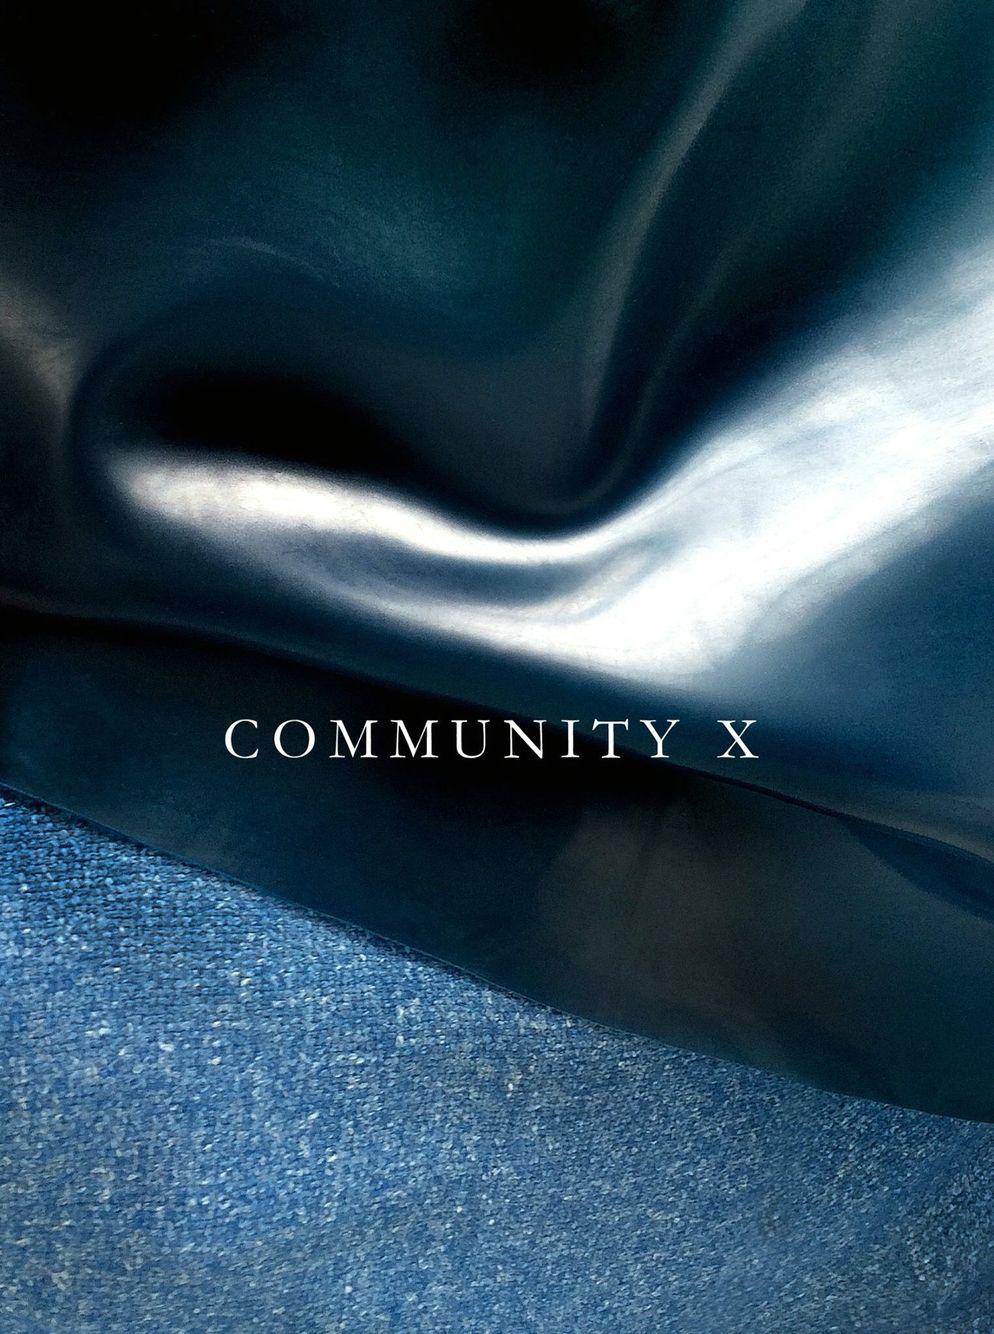 Community X garments